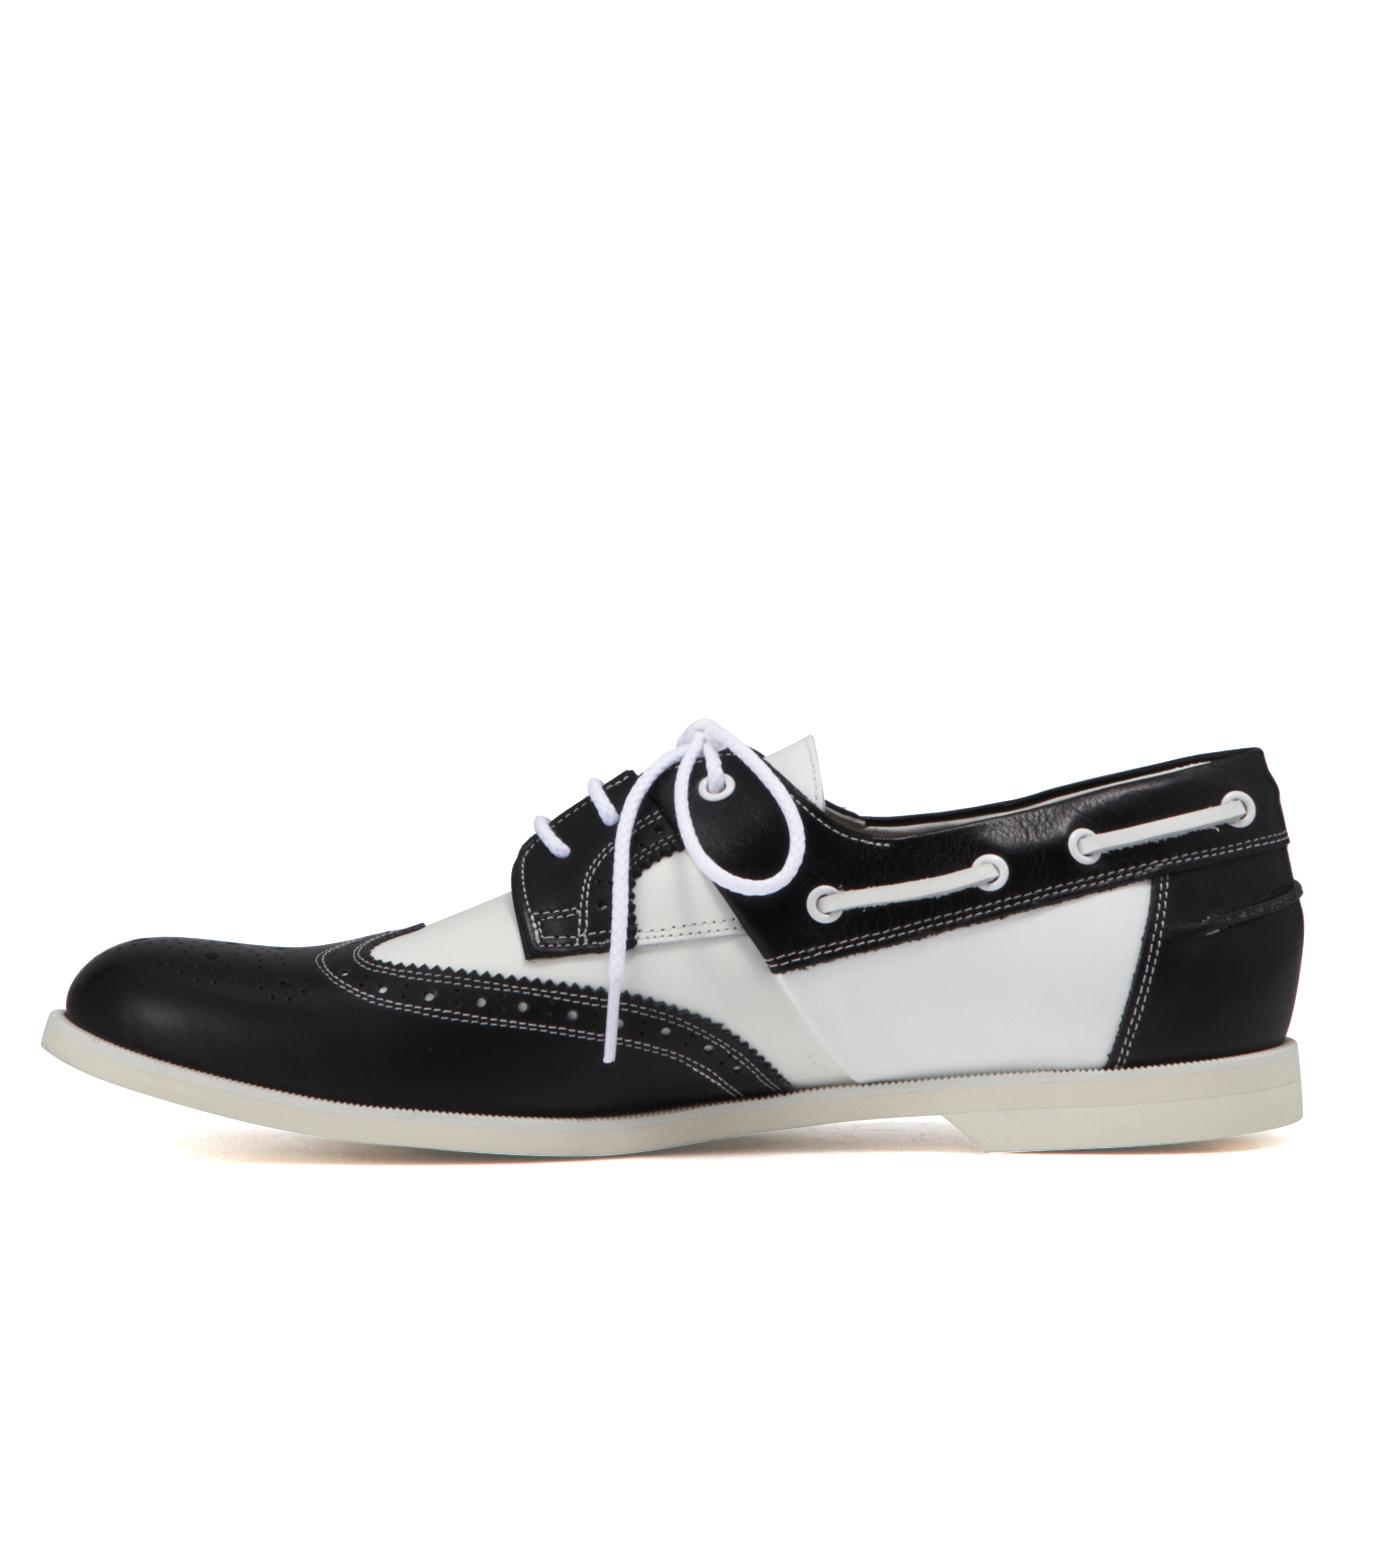 Miharayasuhiro(ミハラヤスヒロ)のHalf Deck Shoes-BLACK-53250500 拡大詳細画像2